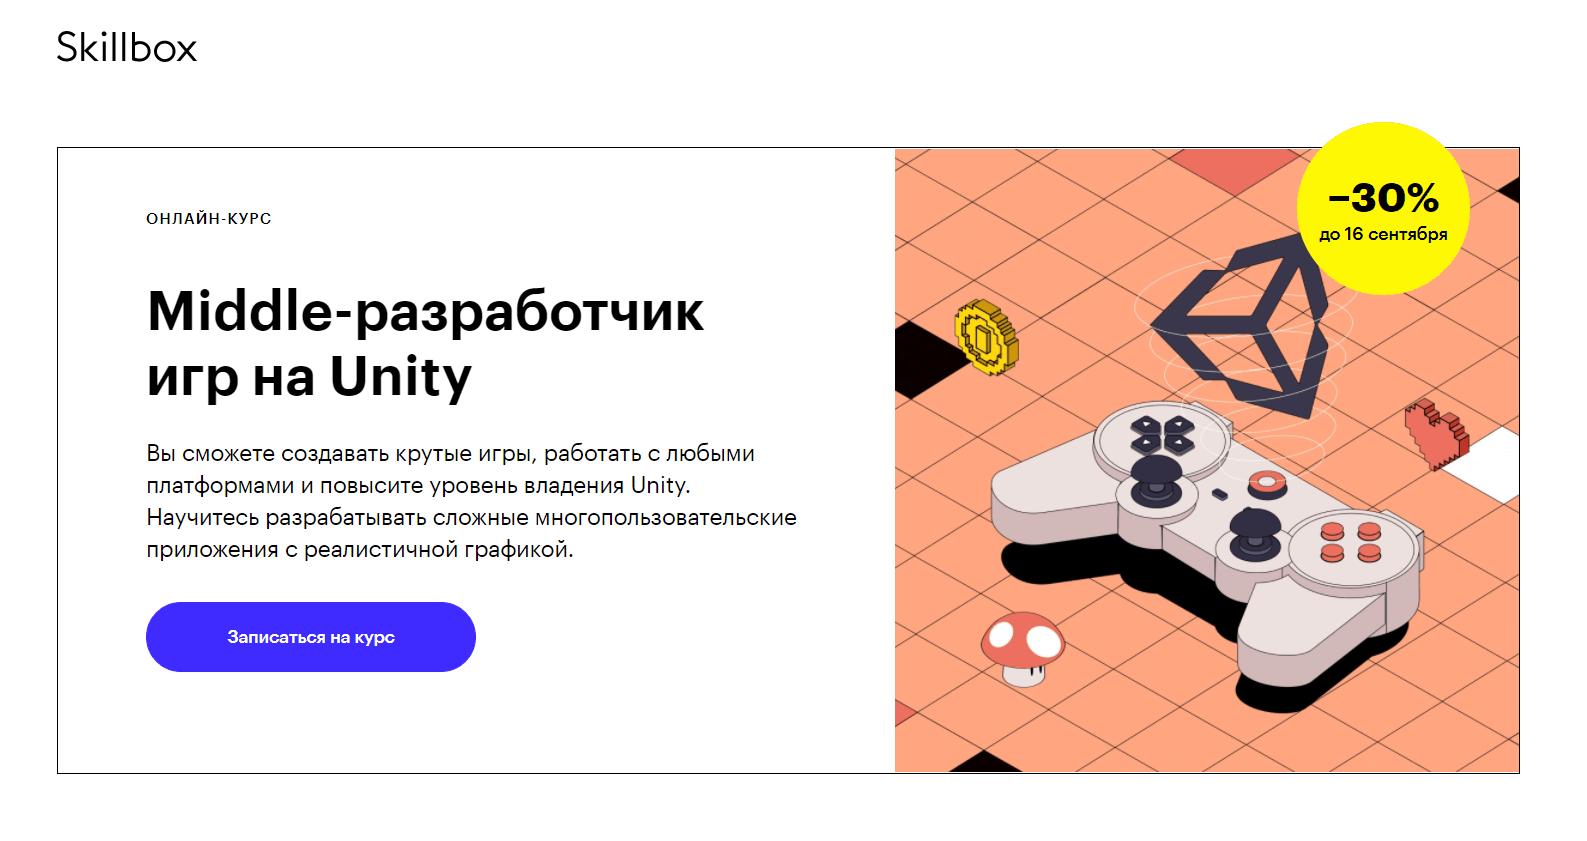 Middle-разработчик игр на Unity